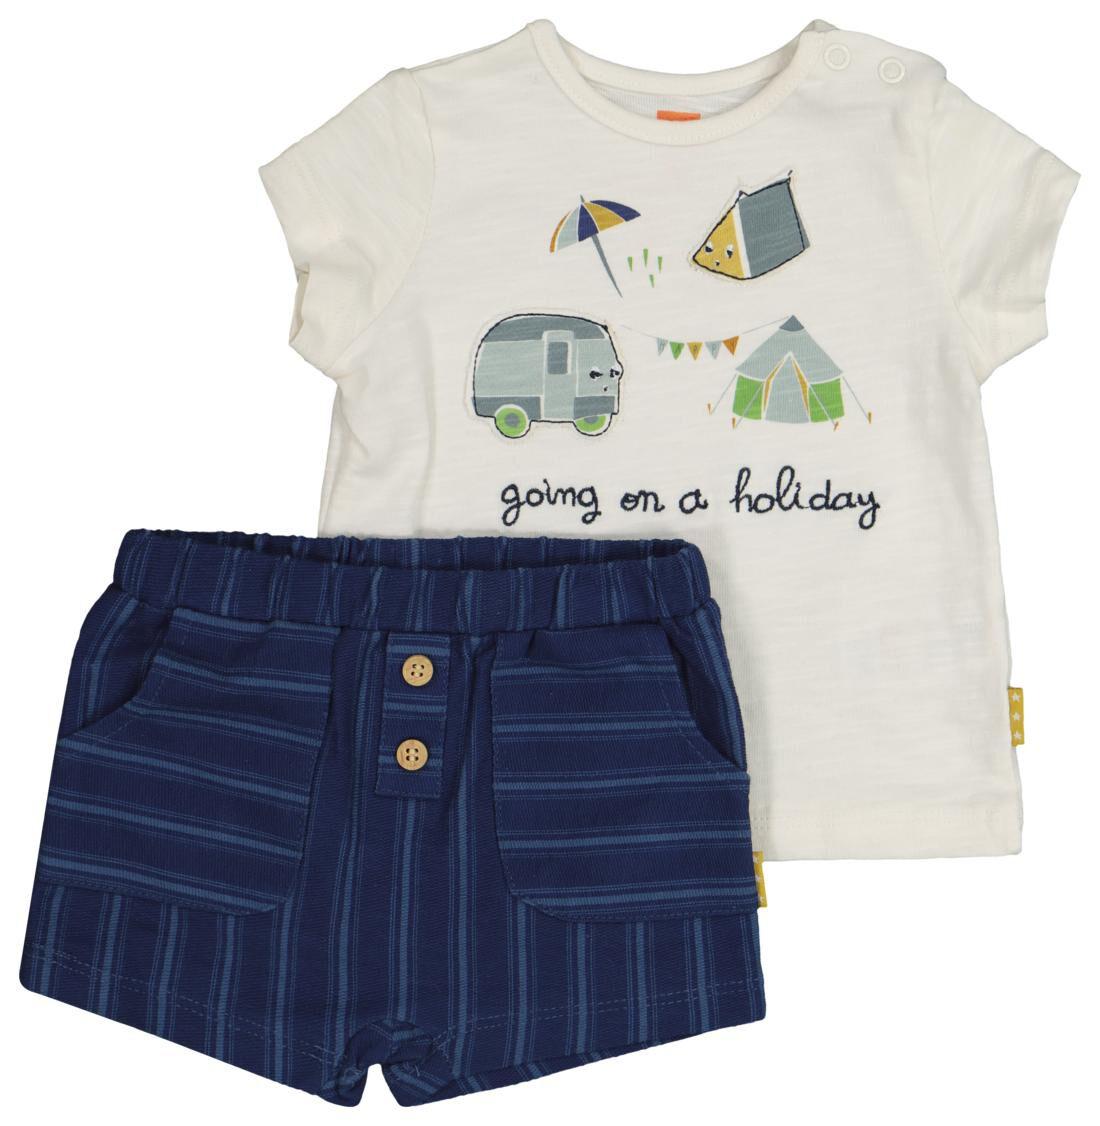 HEMA Newborn Set - T-shirt En Short - Biologisch Katoen Wit (wit)